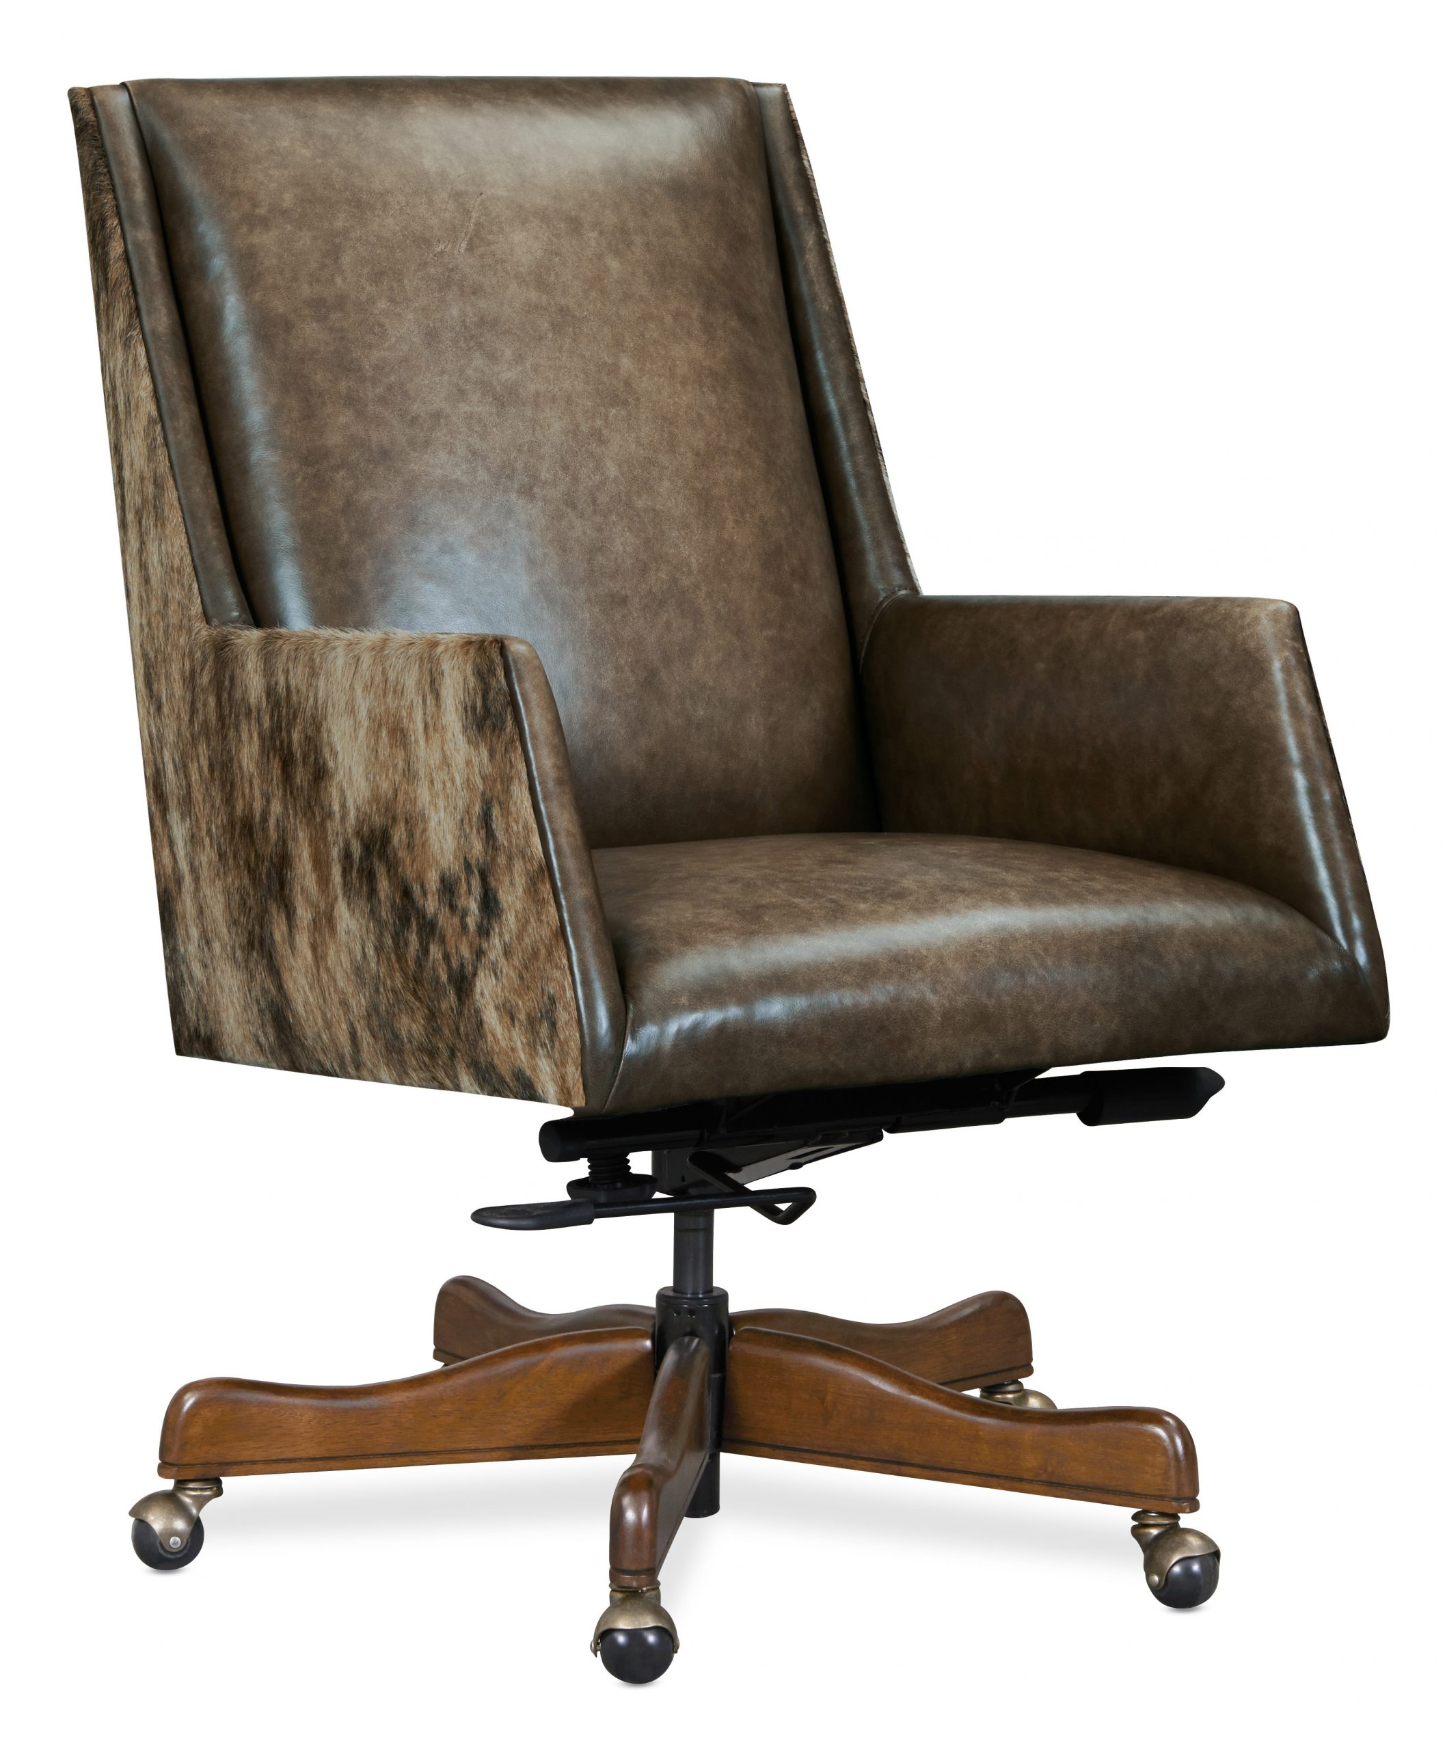 Rives Executive Swivel Tilt Chair